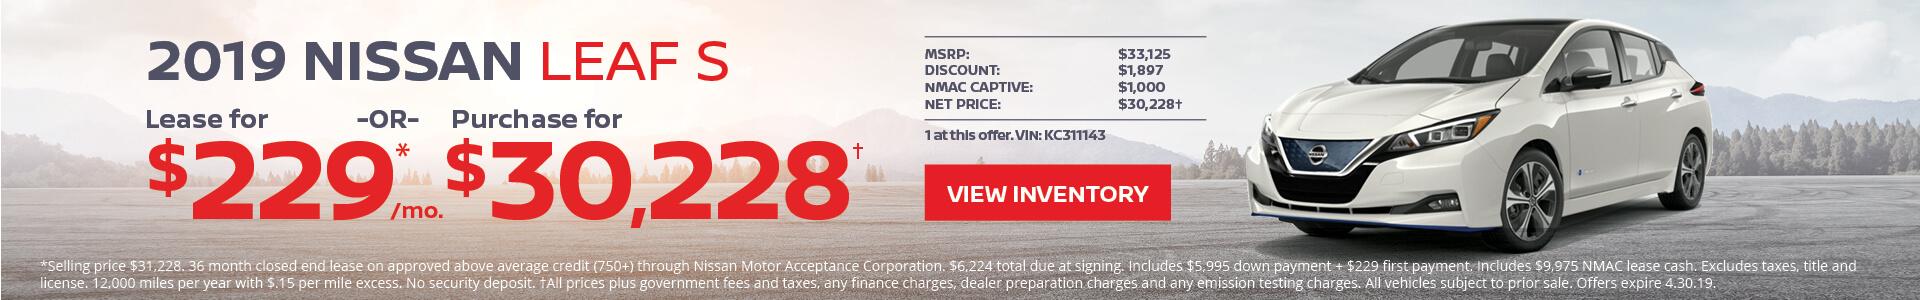 Nissan Leaf $229 Lease